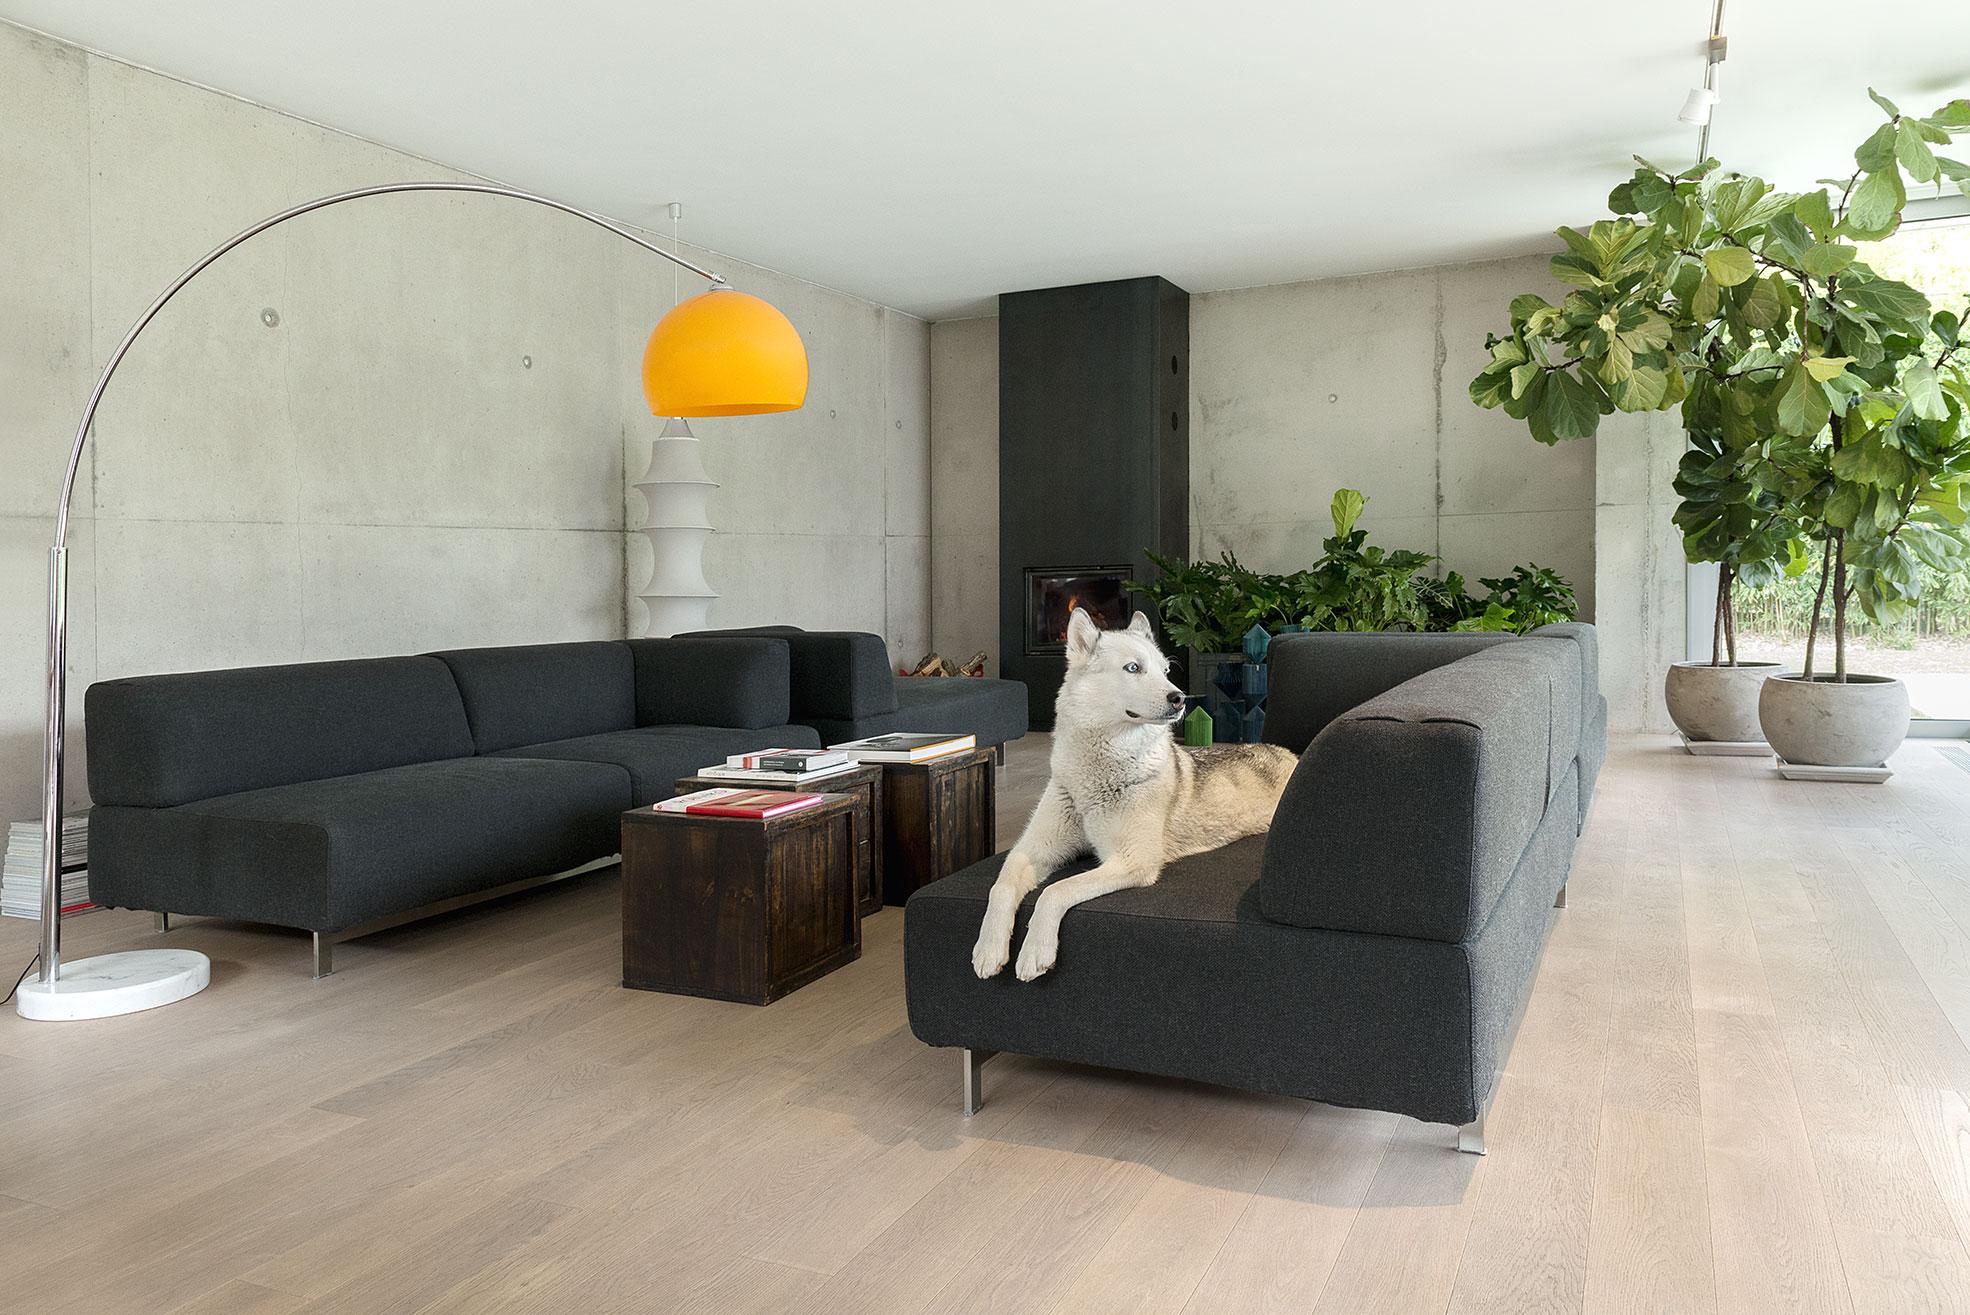 Living room with a white dog on the sofa in the concrete and minimalist villa of Rosalba Piccinni Photographer Maria Teresa Furnari